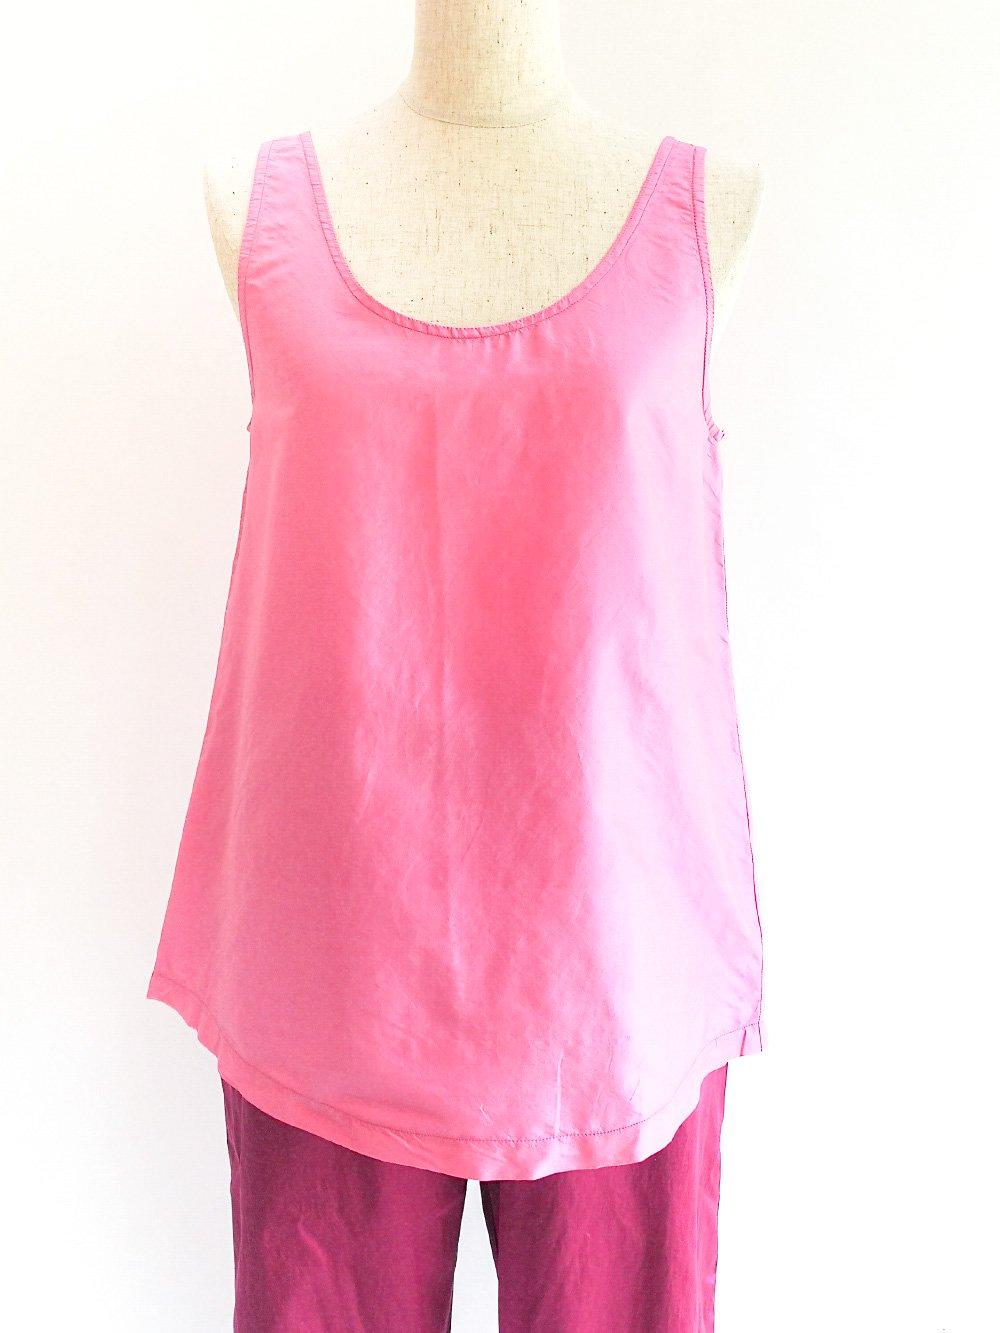 Tanktop / pink